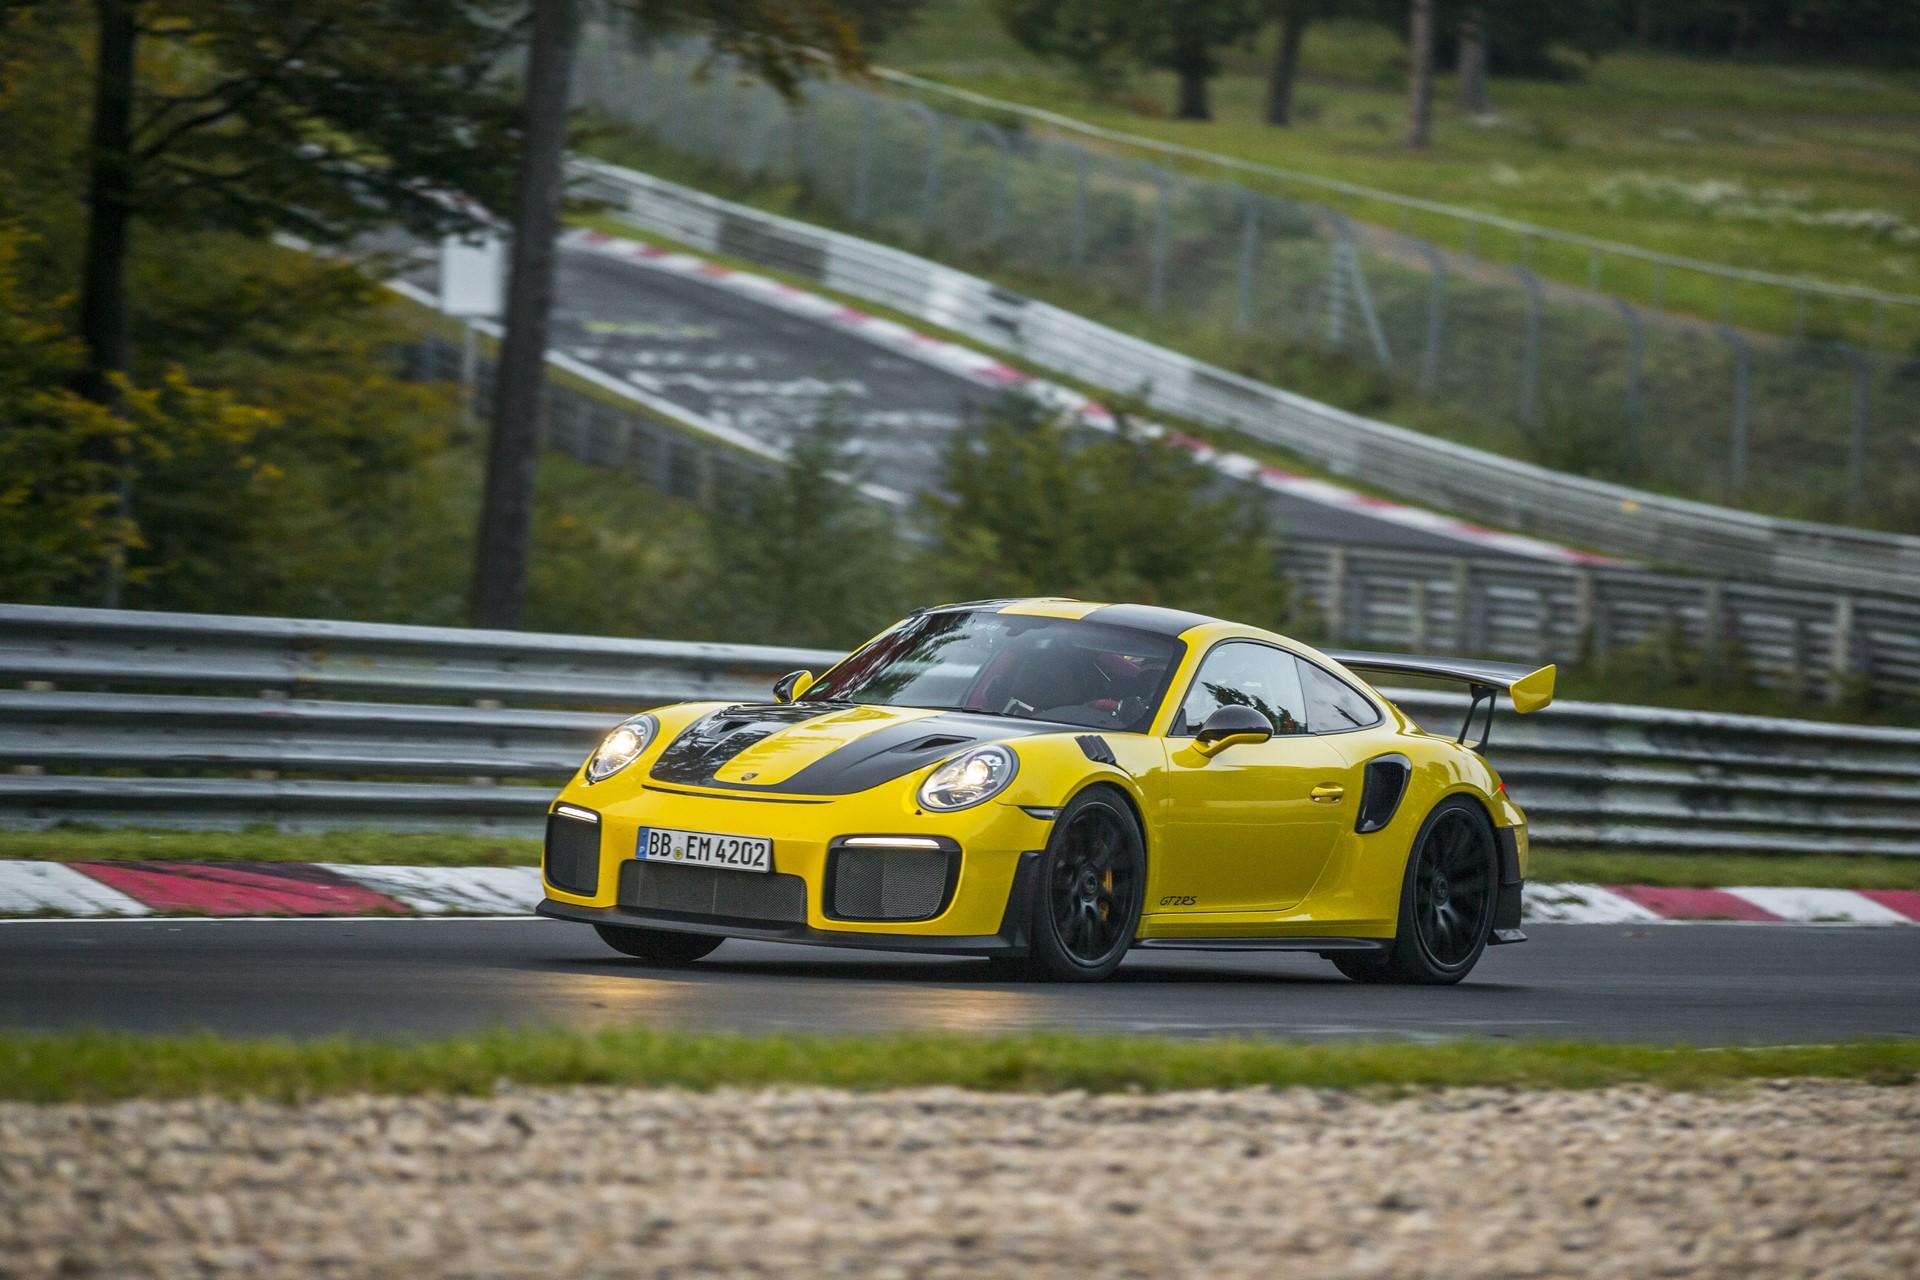 Porsche 911 GT2 RS Nurburgring lap record (3)